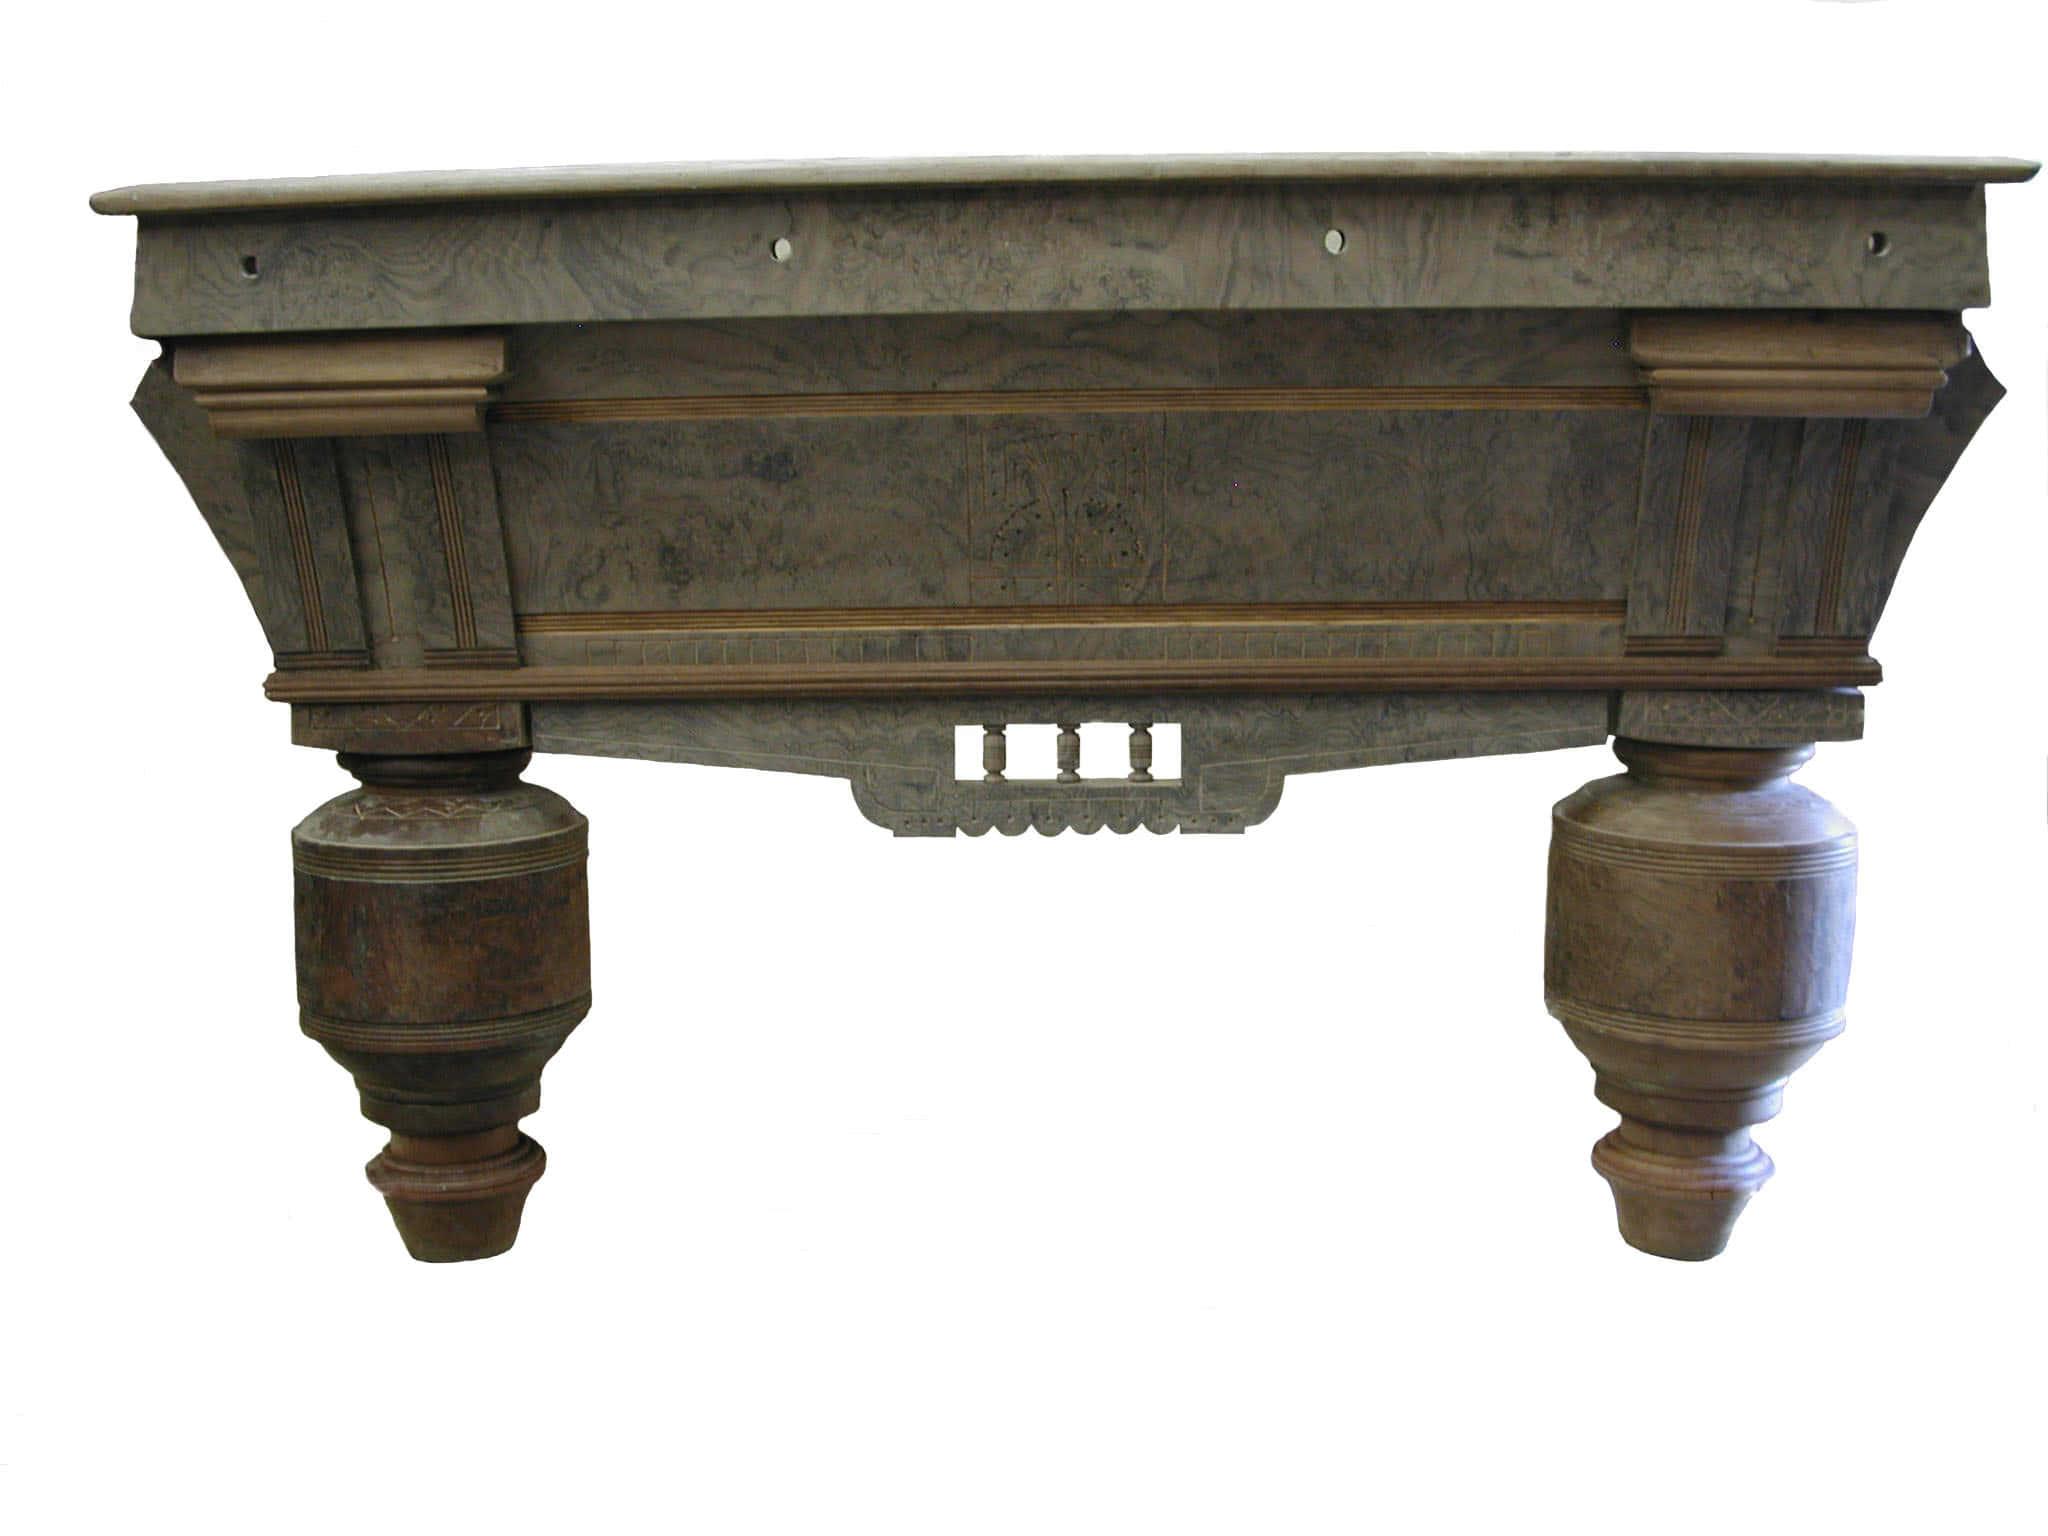 Antique Brunswick Balke Collender Billiard Company Carved Walnut Pool Table